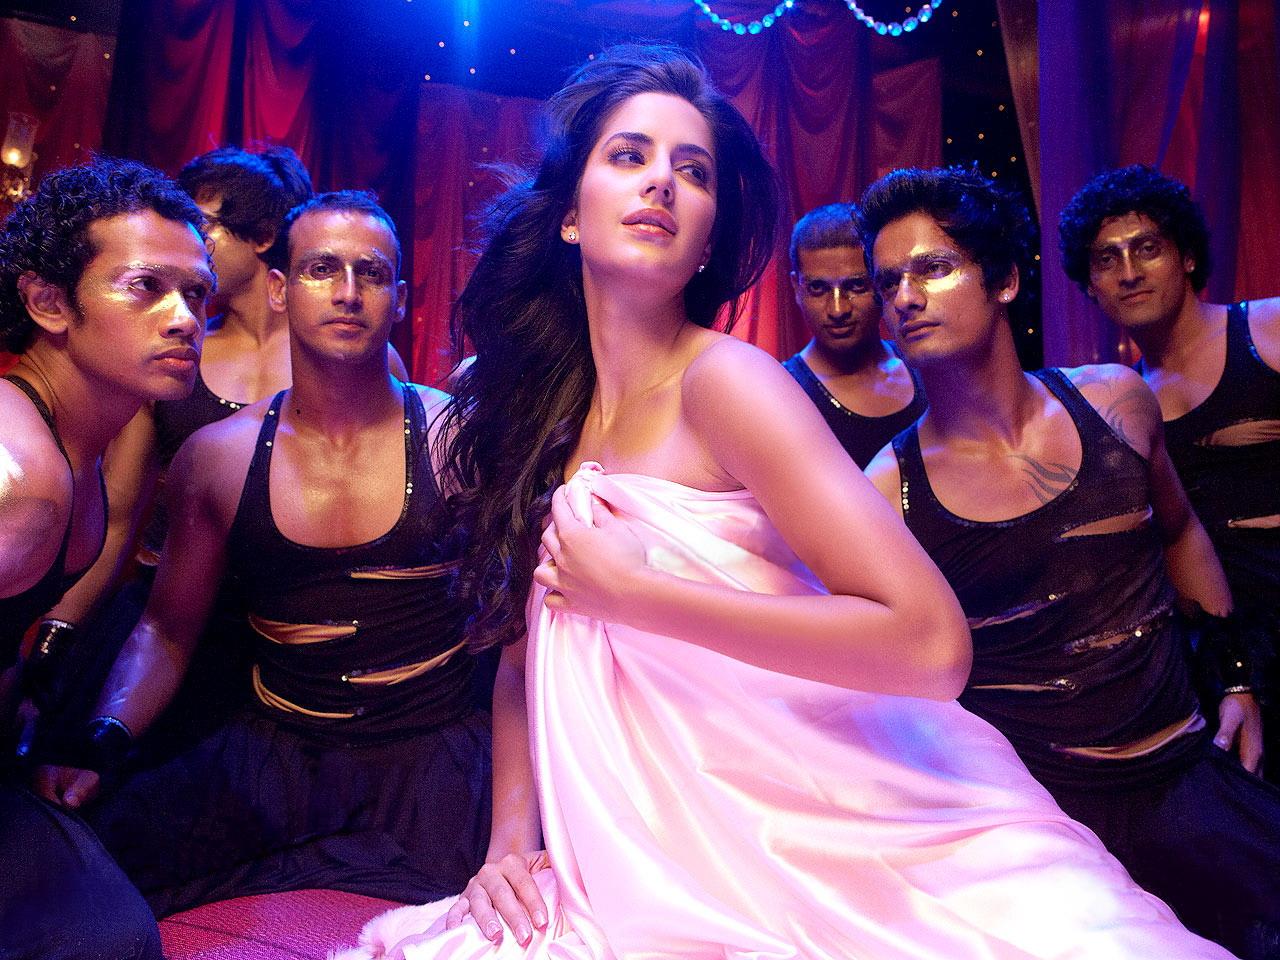 Only-Katrina Katrina Kaif In Sheila Ki Jawani Song -6587